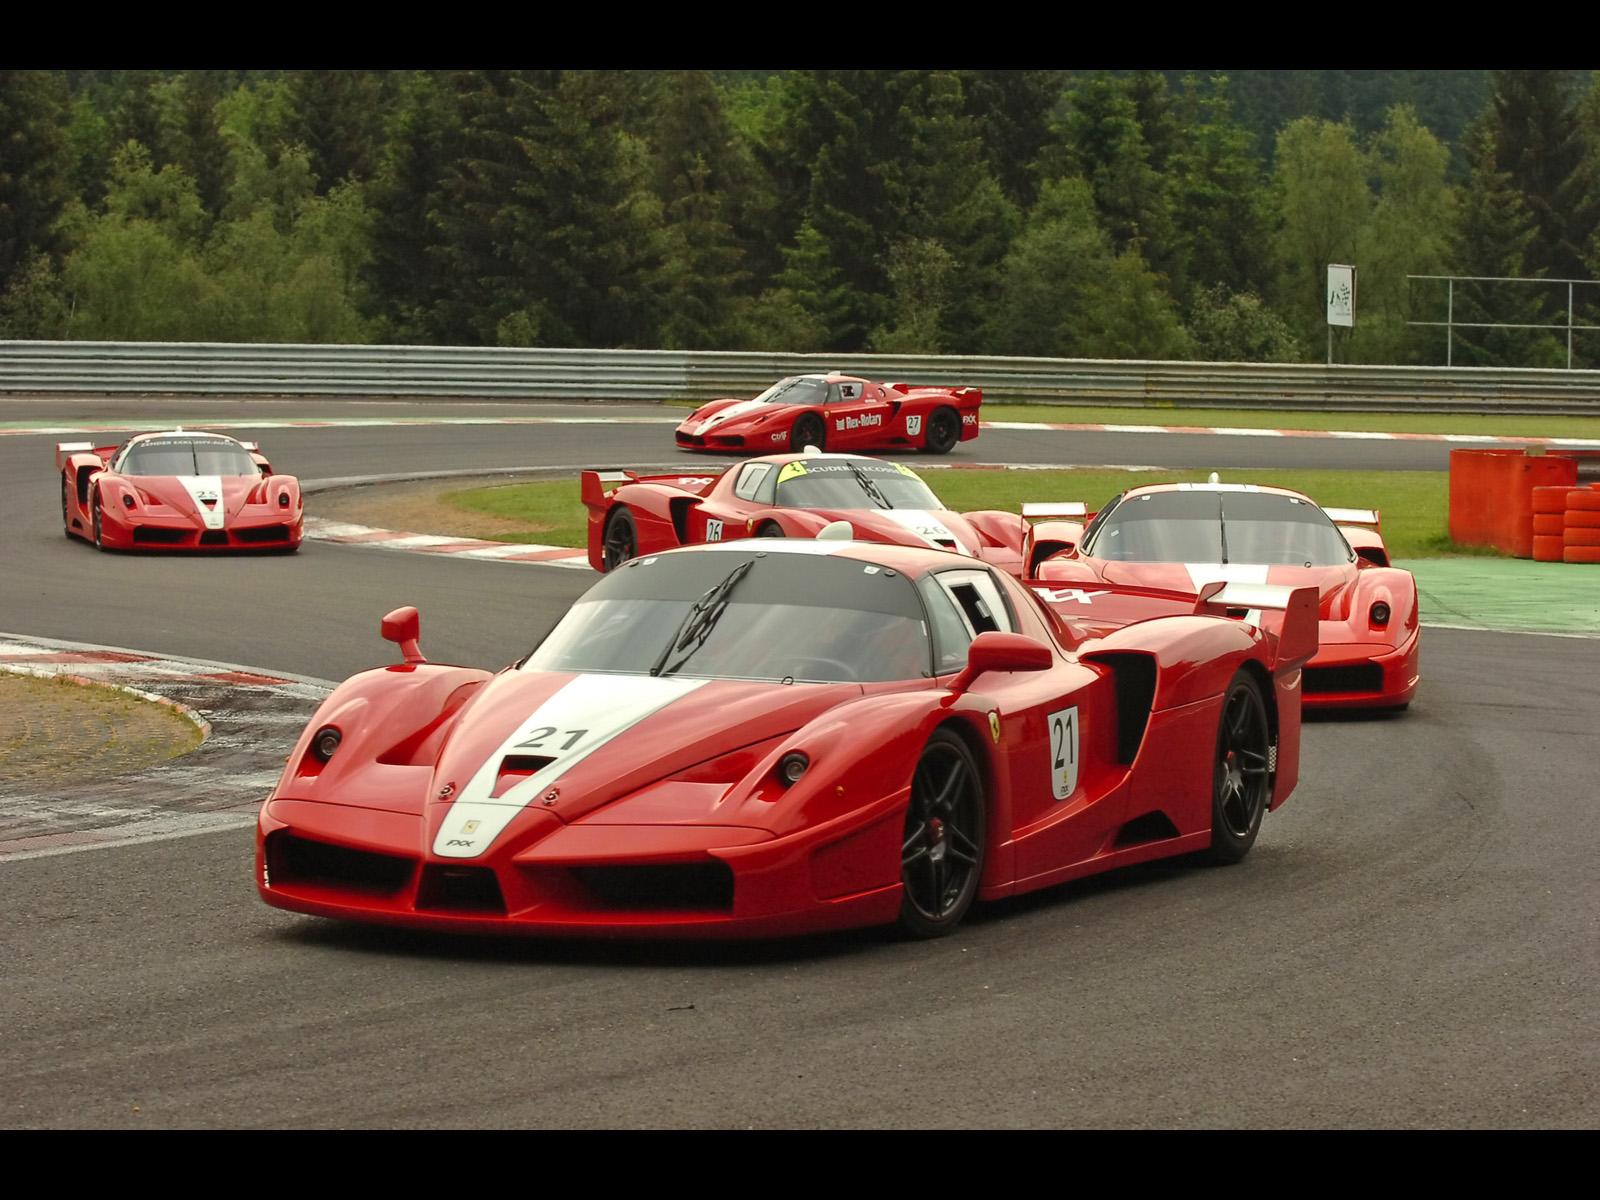 Best Wallpapers: Ferrari FXX Wallpapers